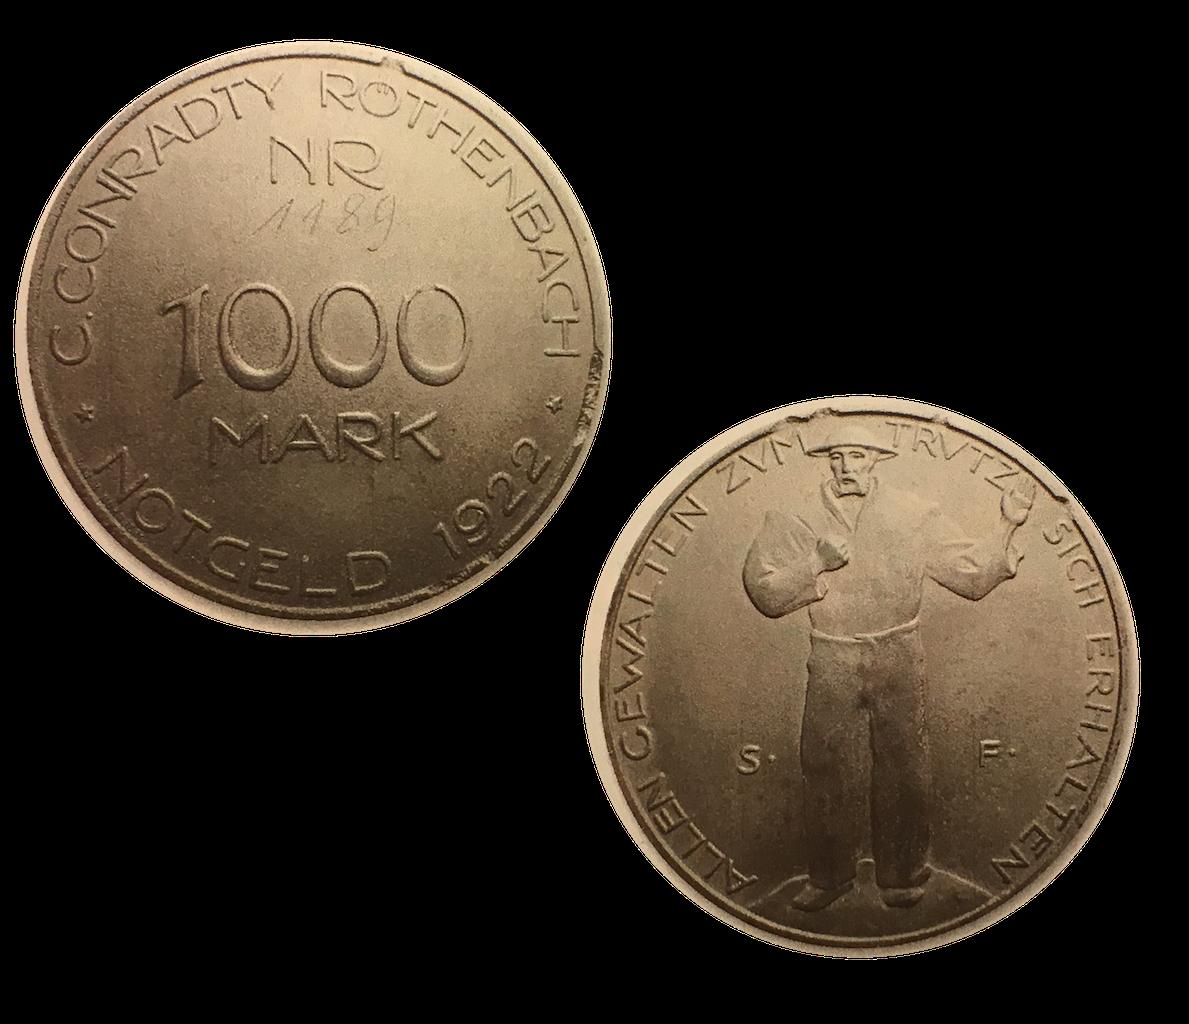 самая большая купюра рубля